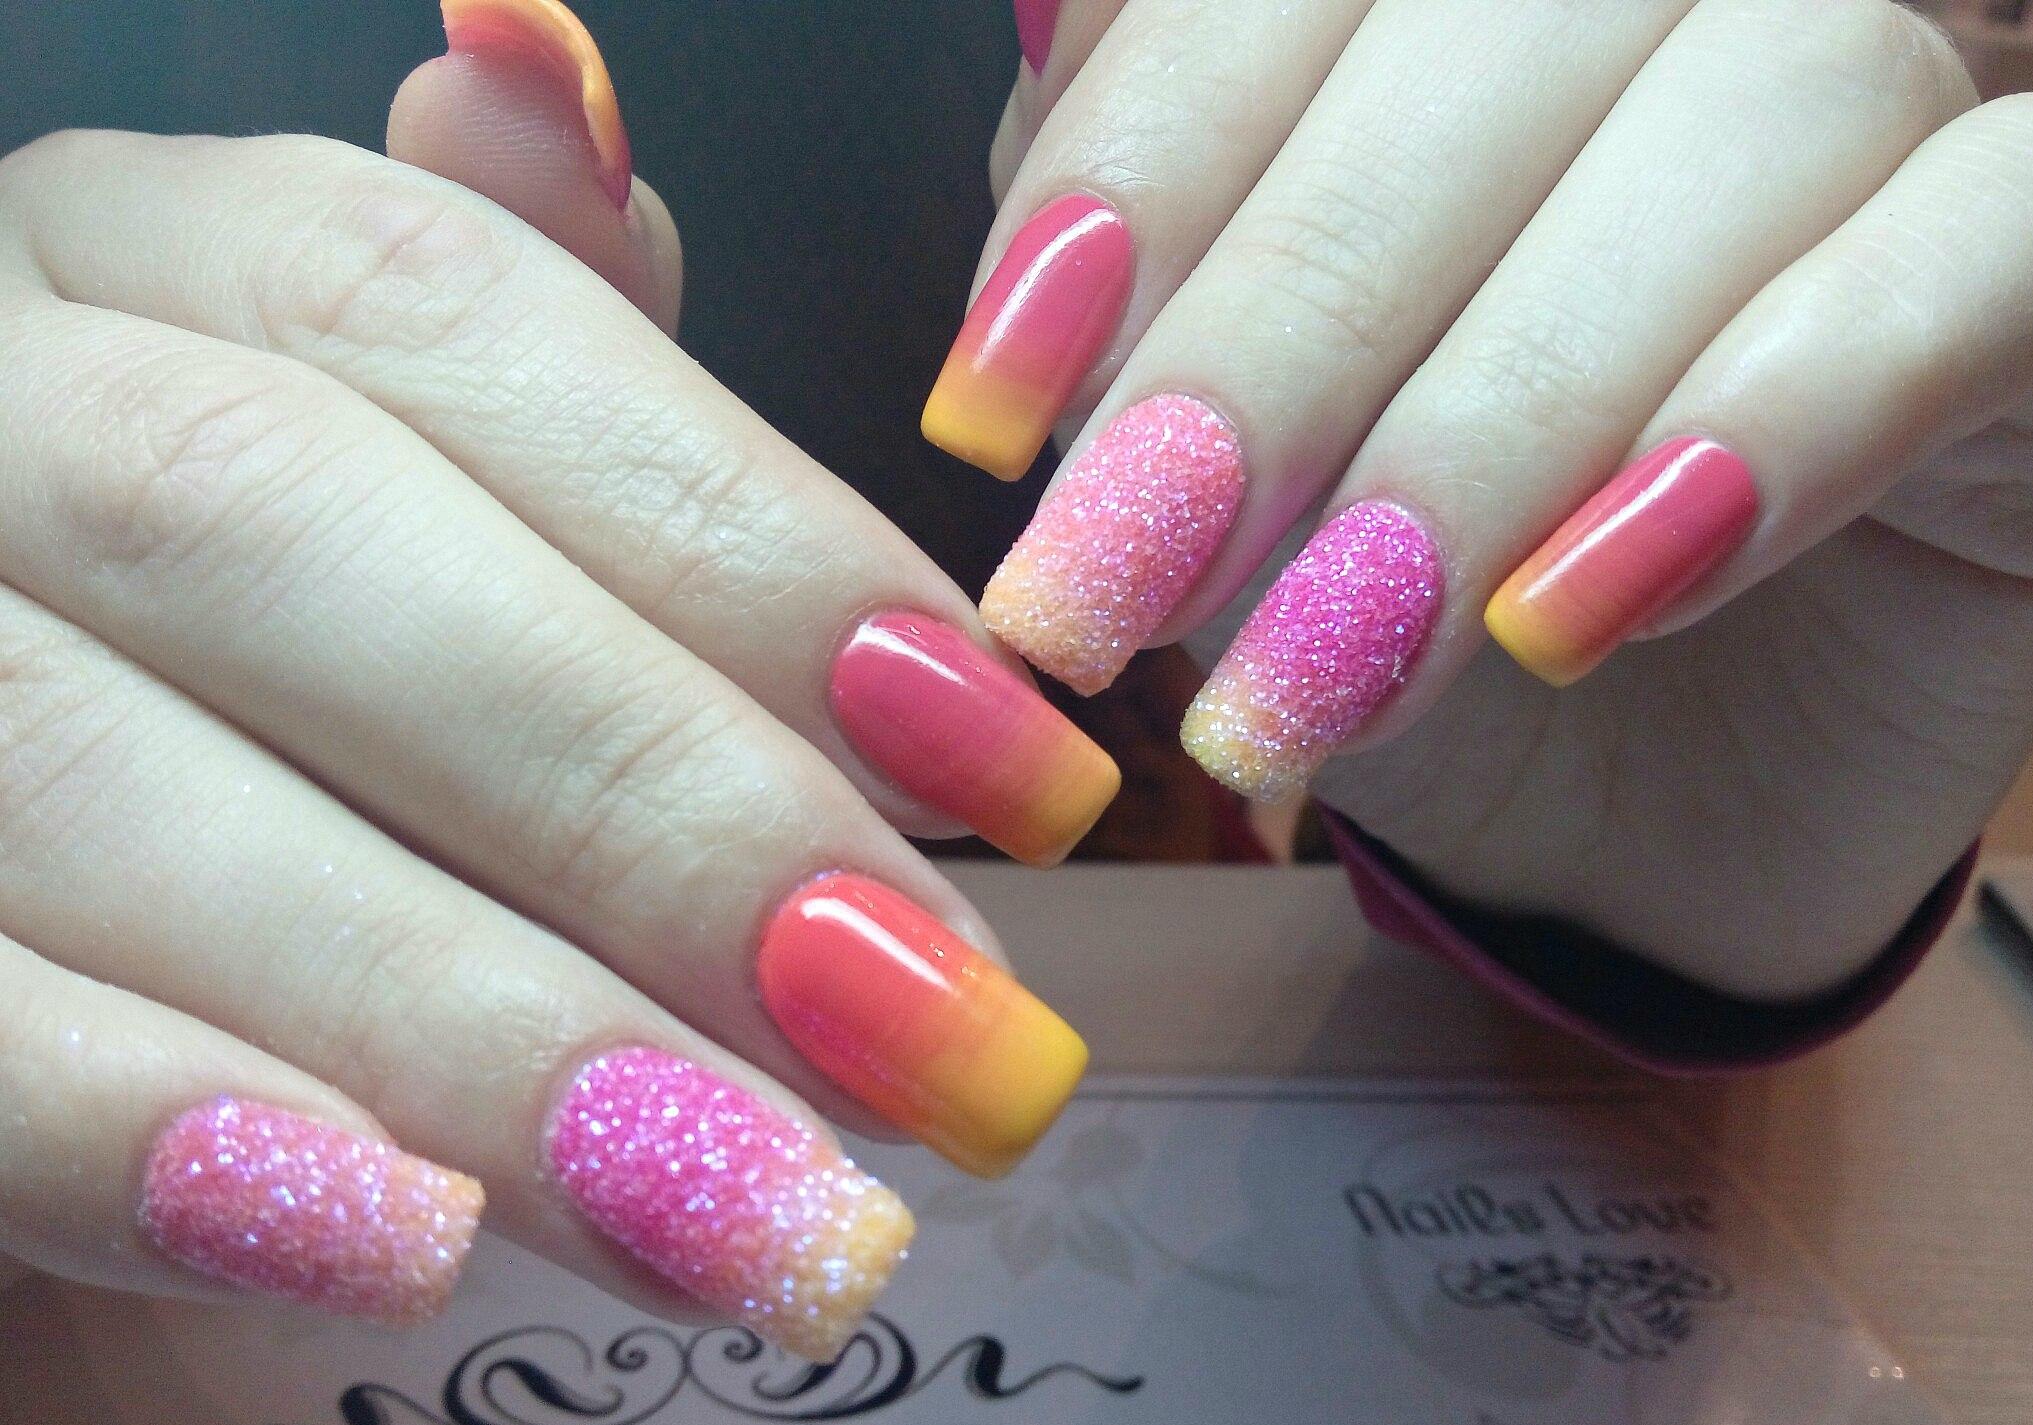 Summer gradient nails - The Best Images | BestArtNails.com